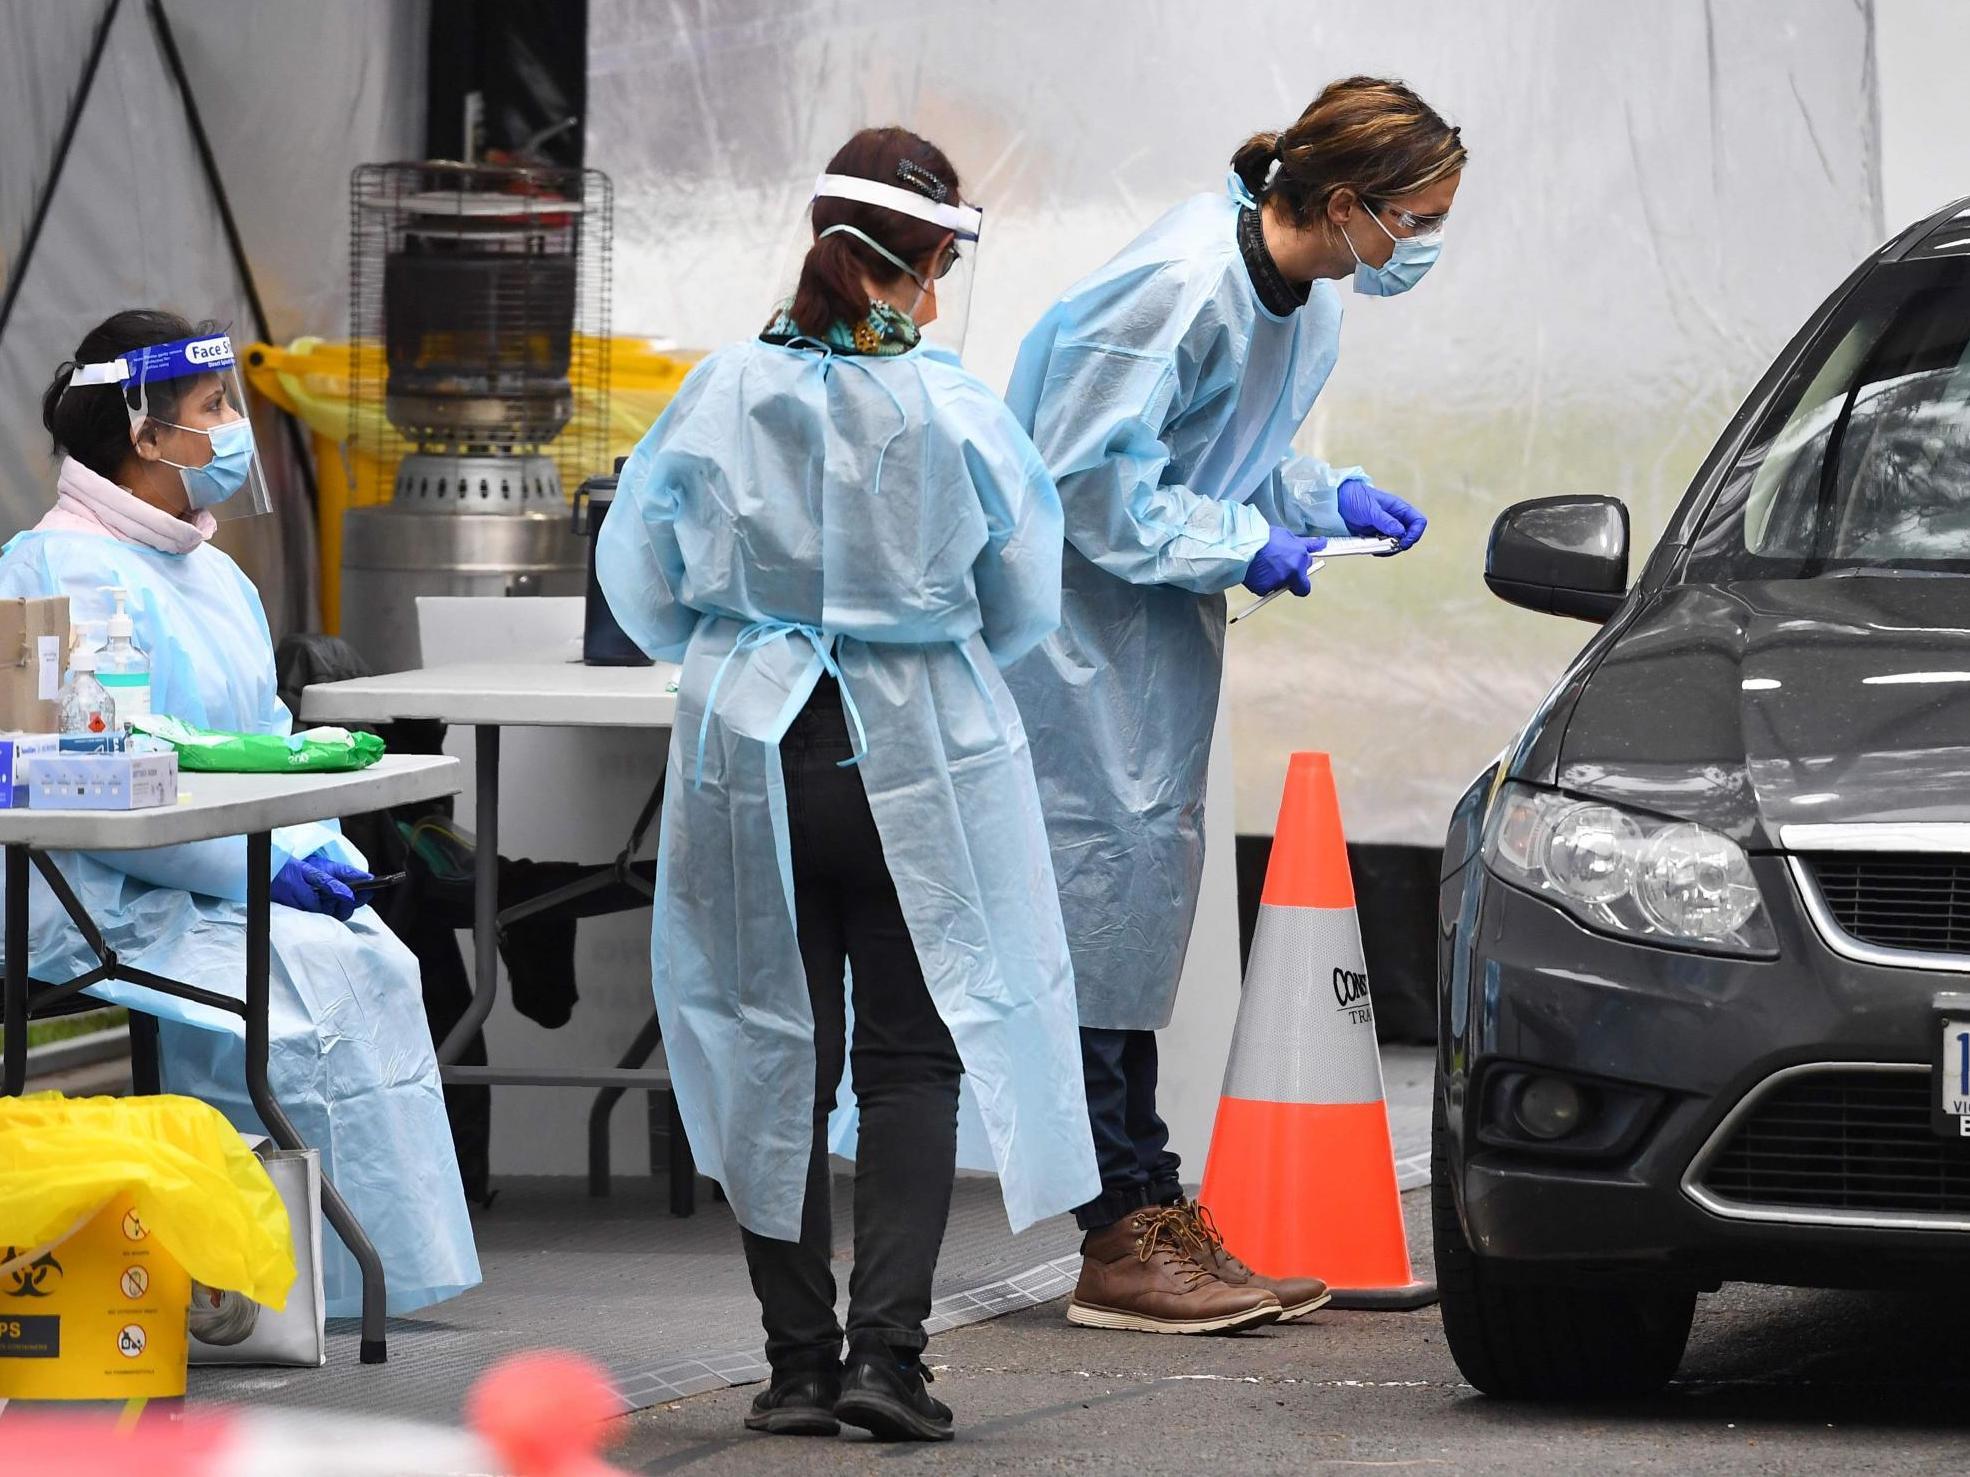 Coronavirus UK news live: Latest updates as figures show 3.4 million infected in England